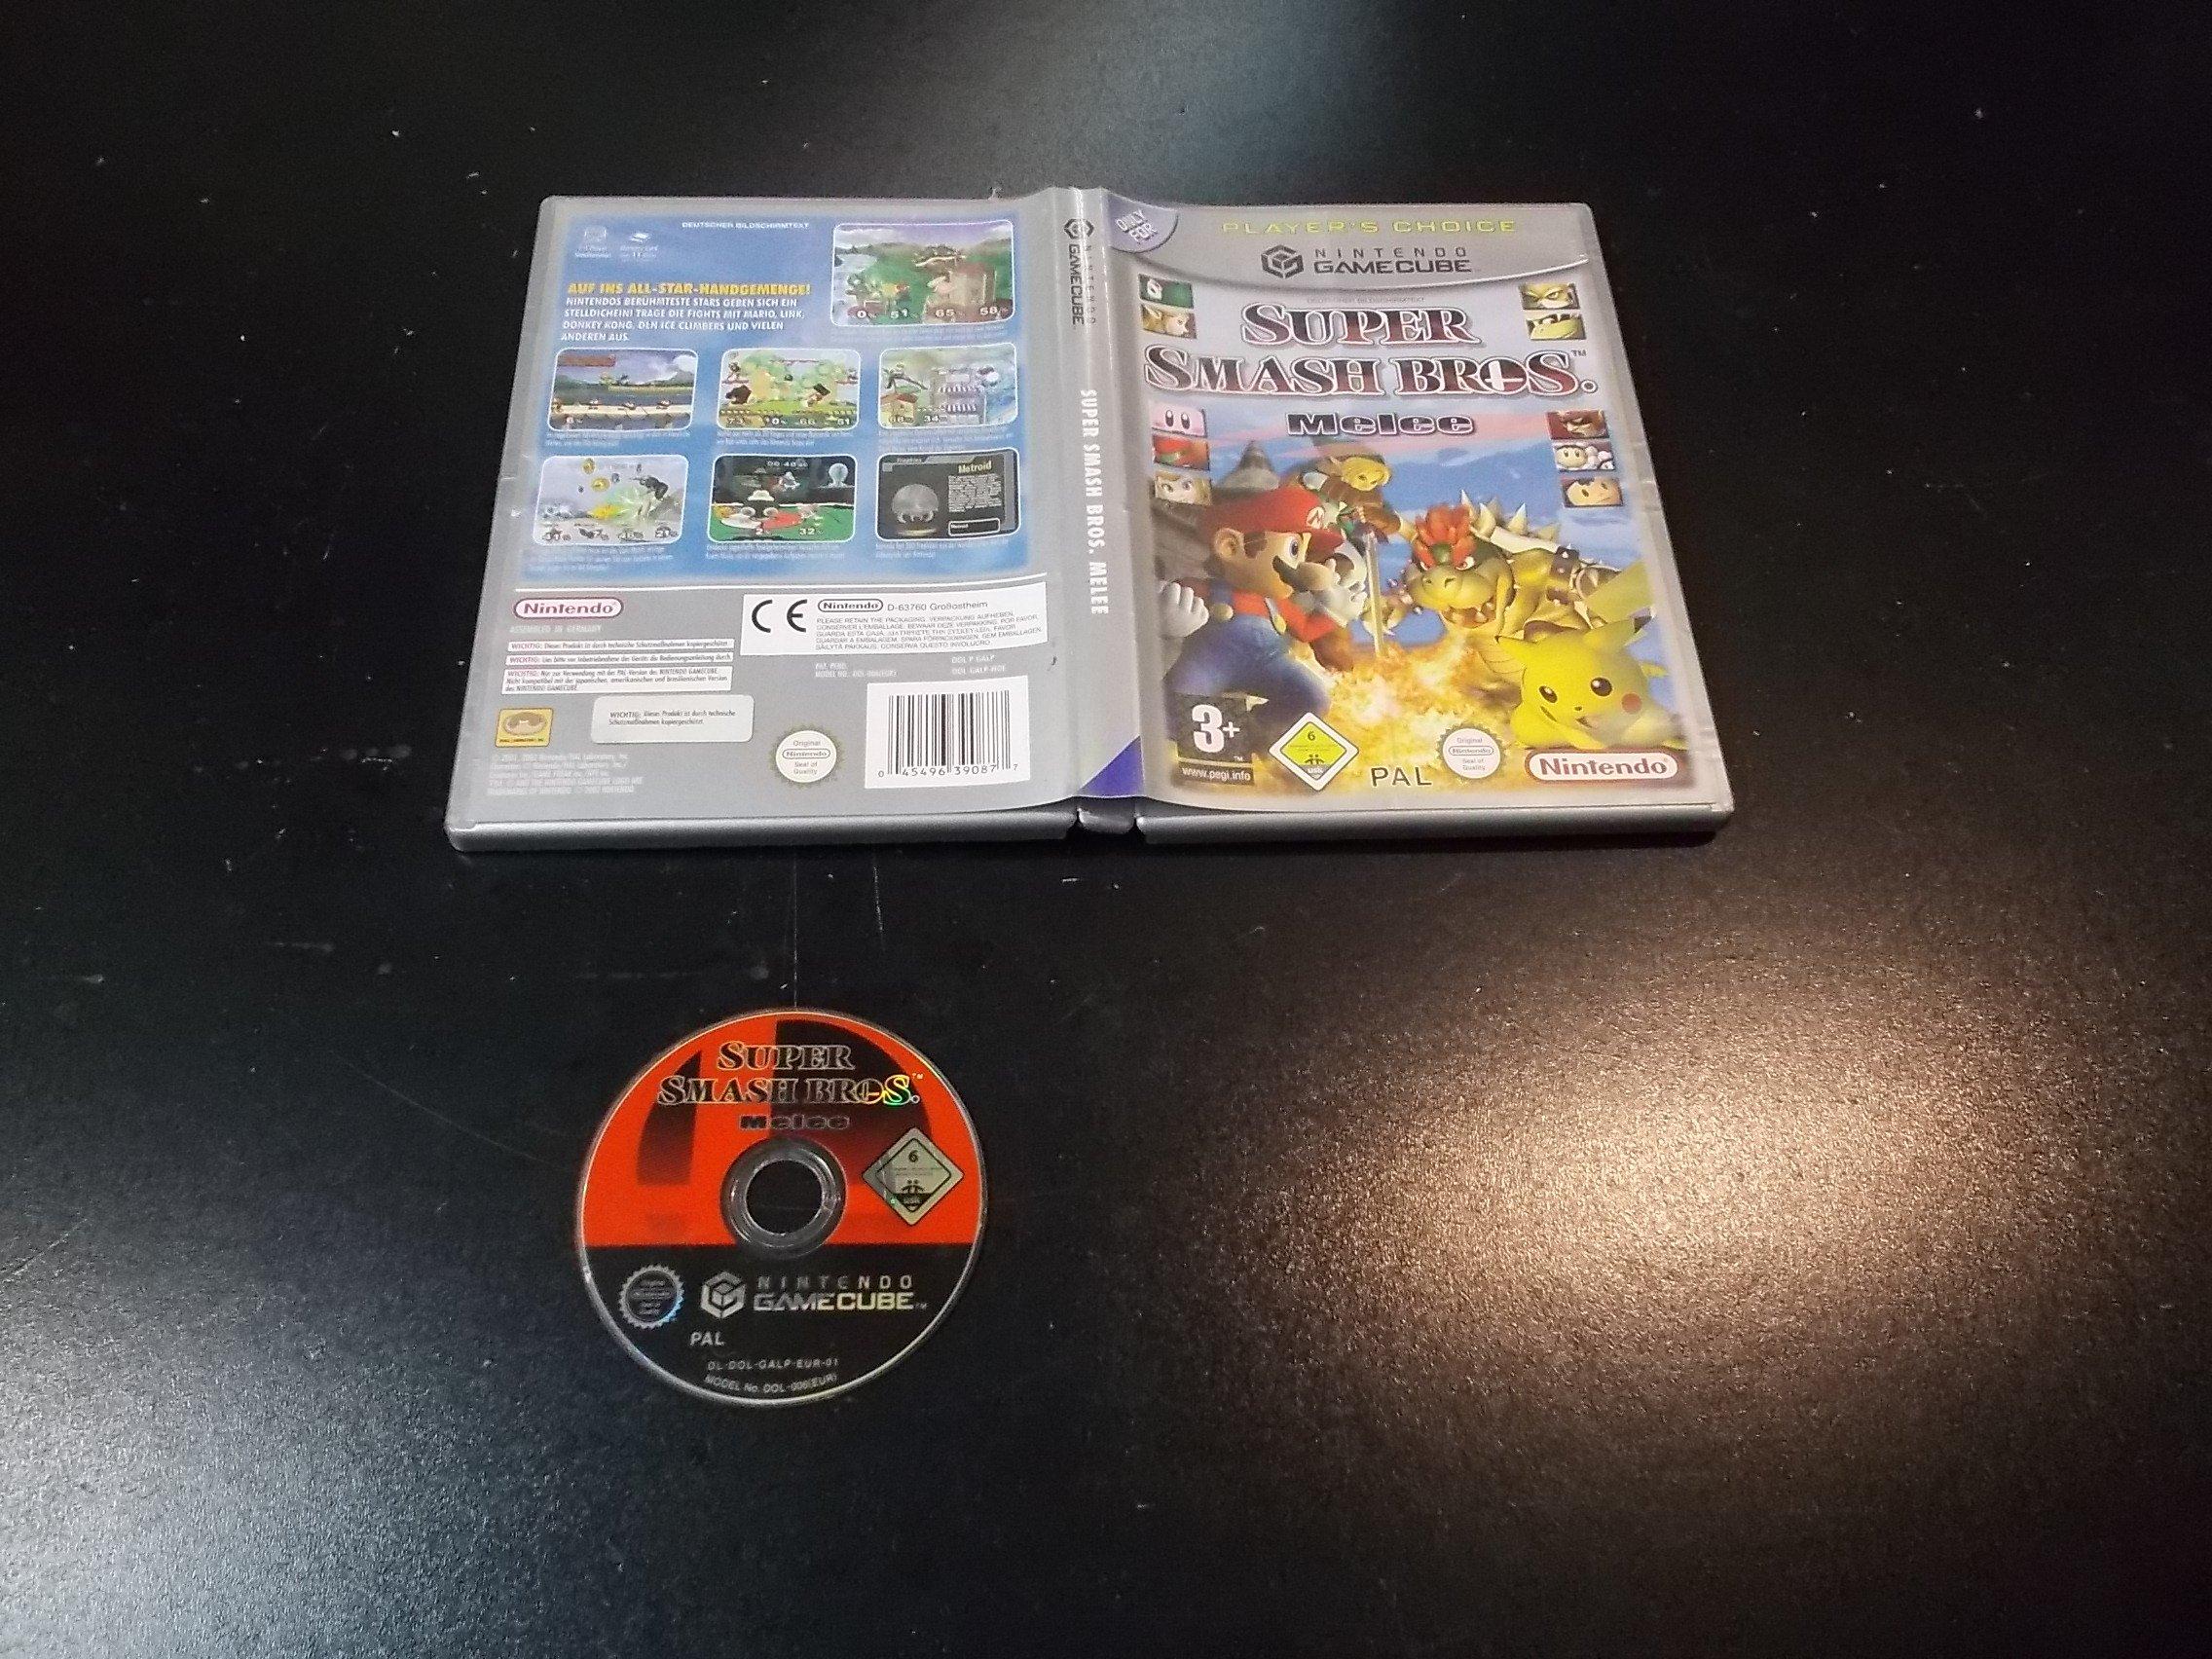 Super Smash Bros Melee - GRA Nintendo GameCube - Sklep 0323